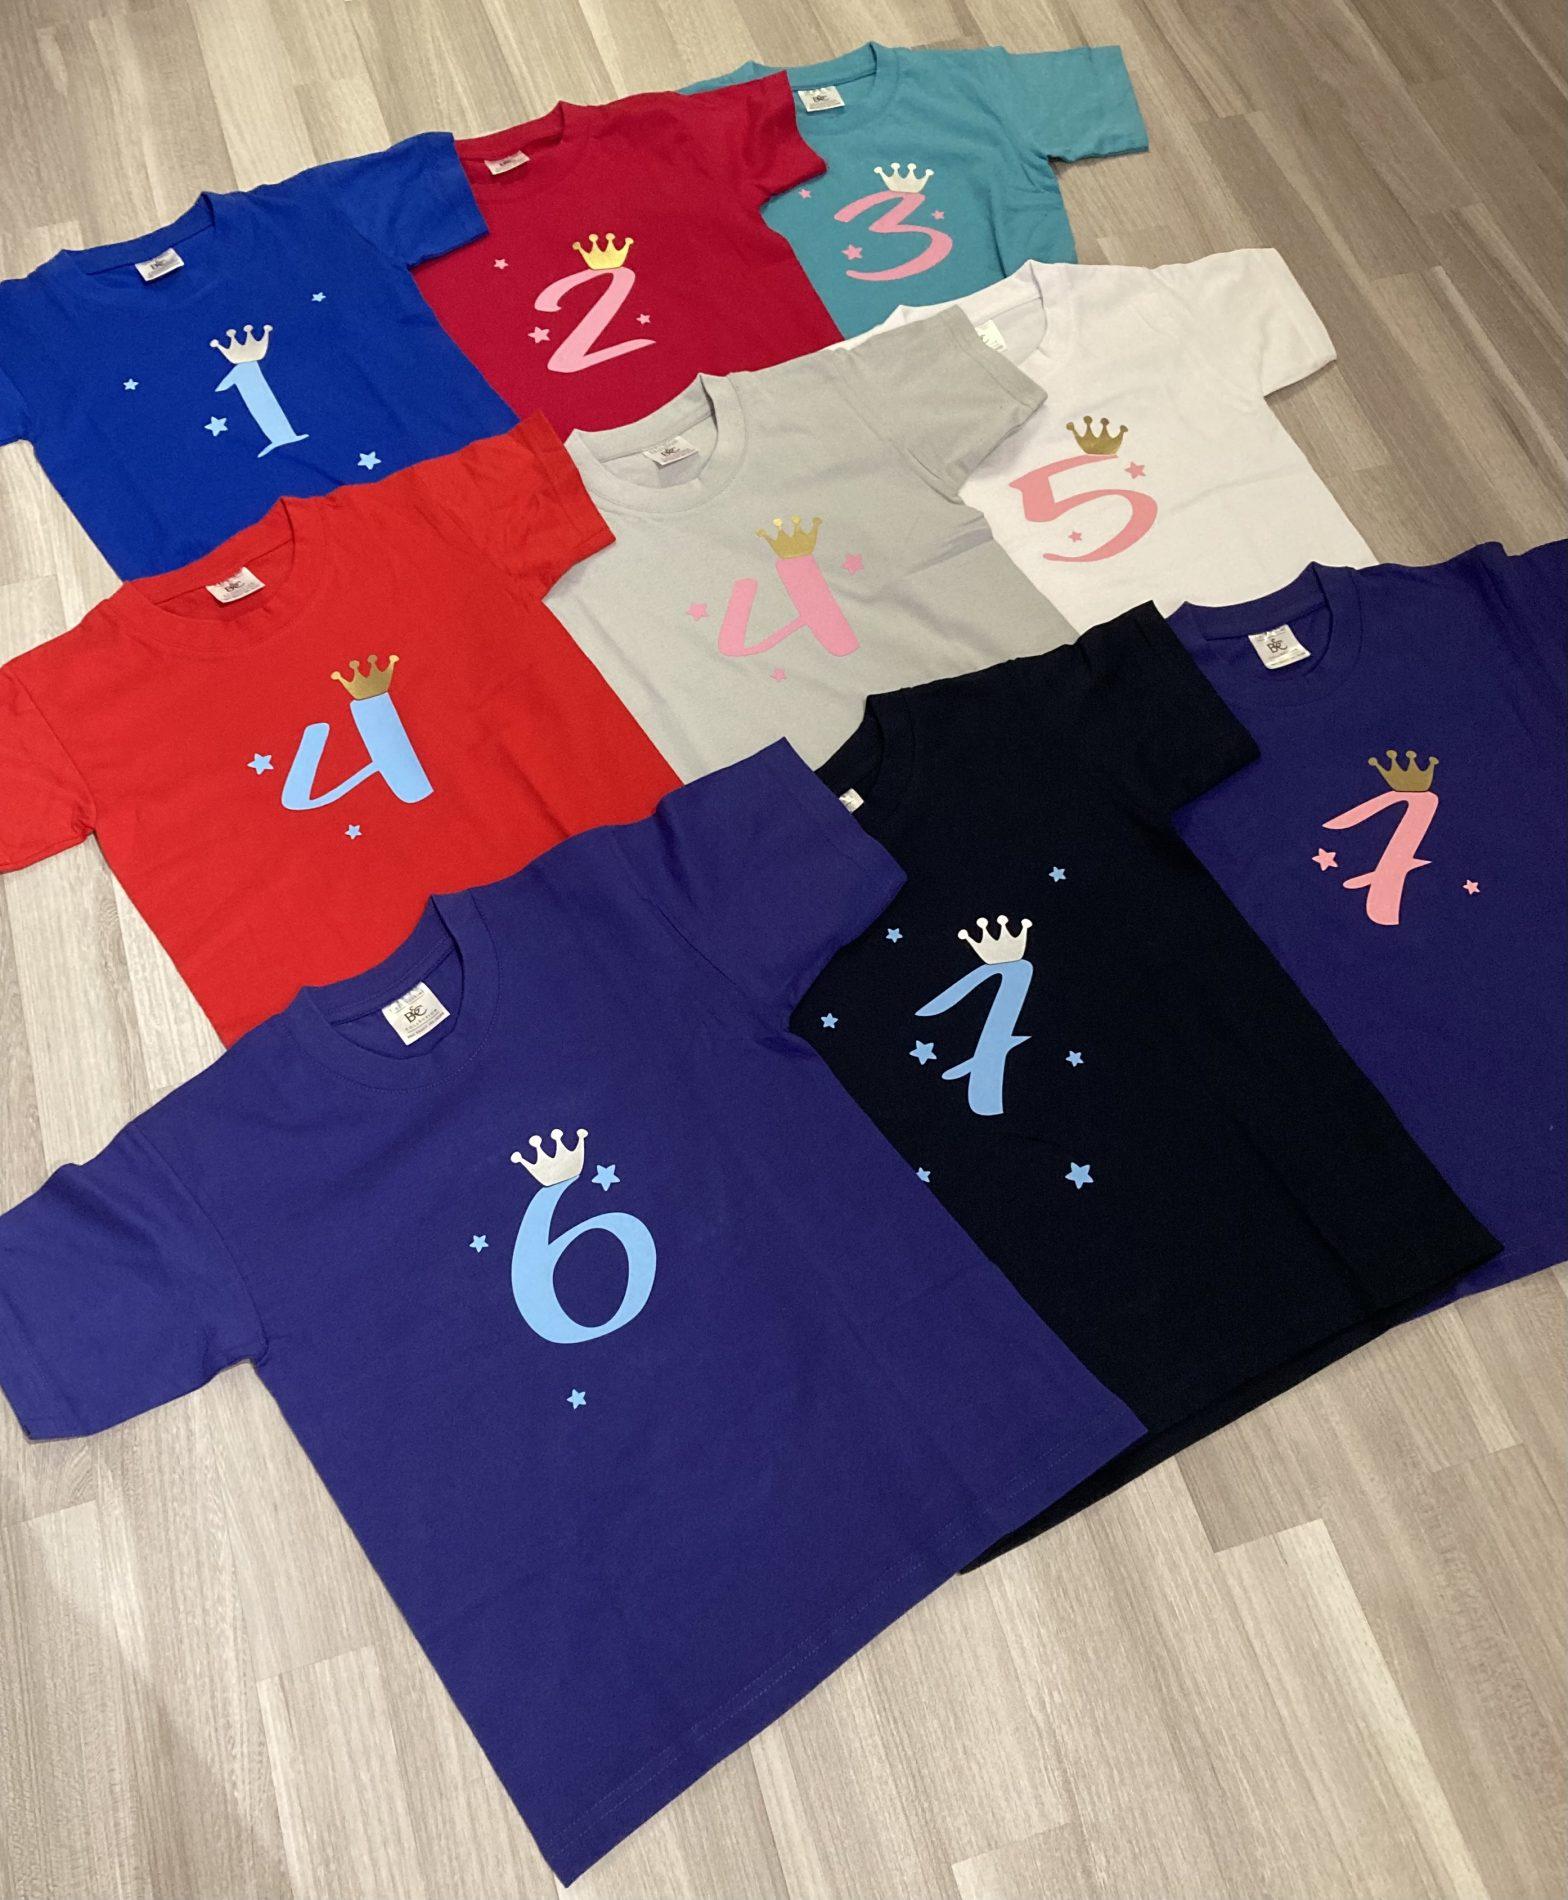 Geburtstags-T-Shirts